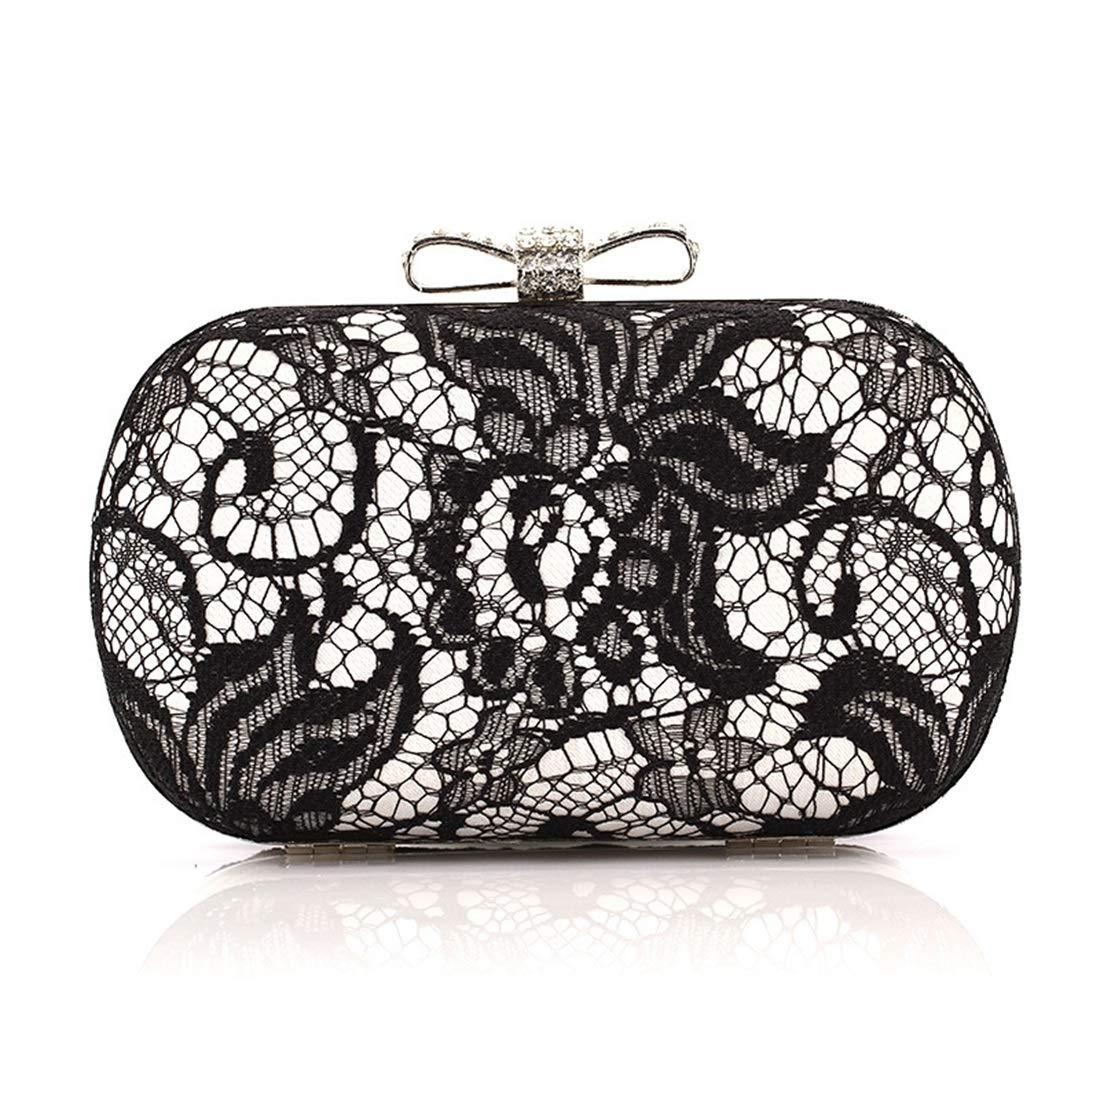 Carriemeow Crossbody Bag Lace Butterfly Dish Satin Evening Bag Clutch Purse Hand